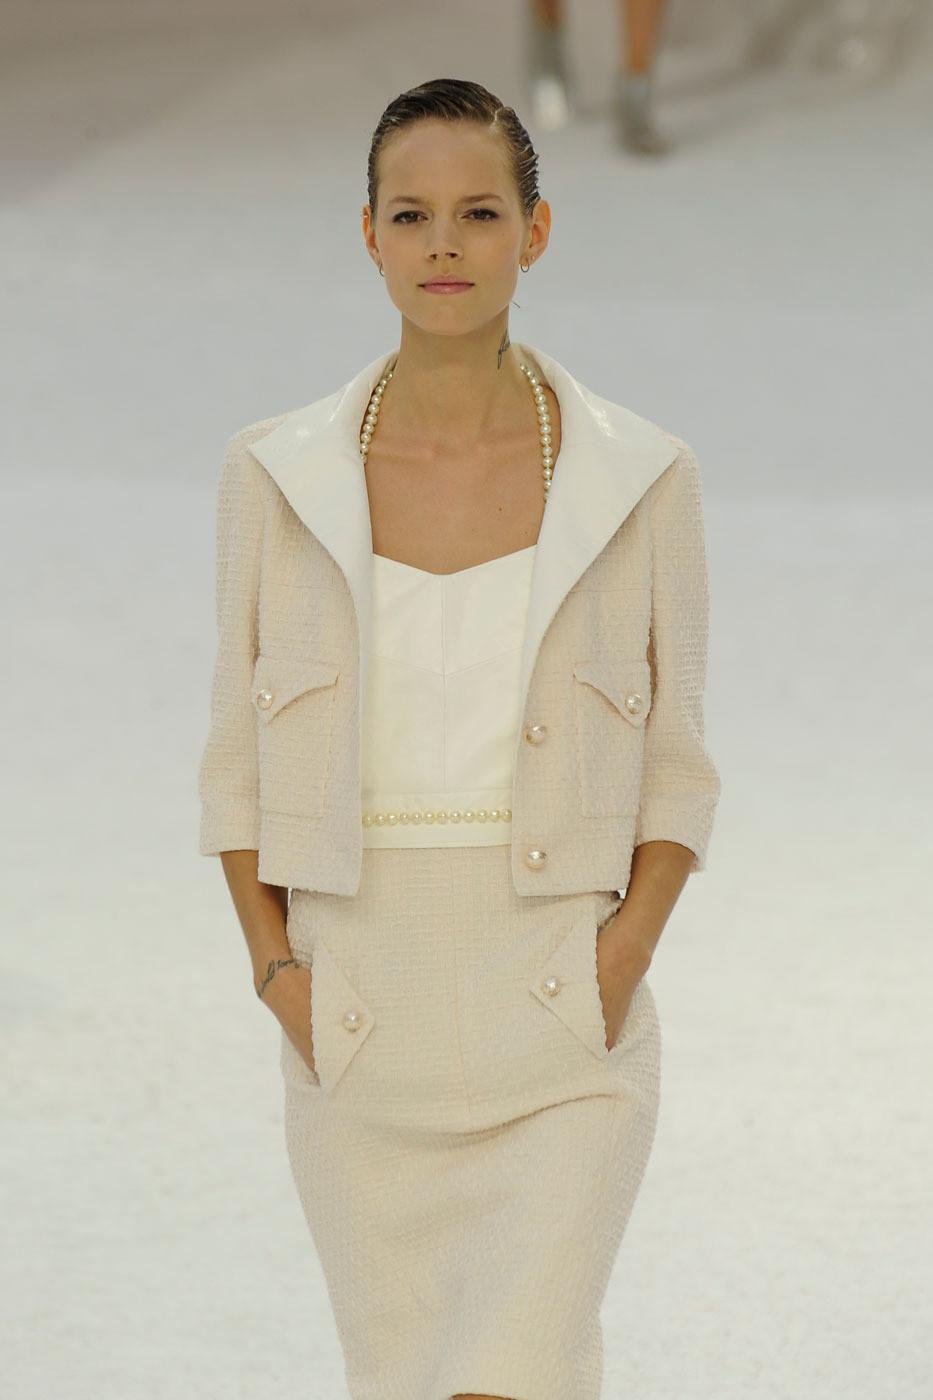 Chanel Spring 2012 Ccnef GUSDUFx